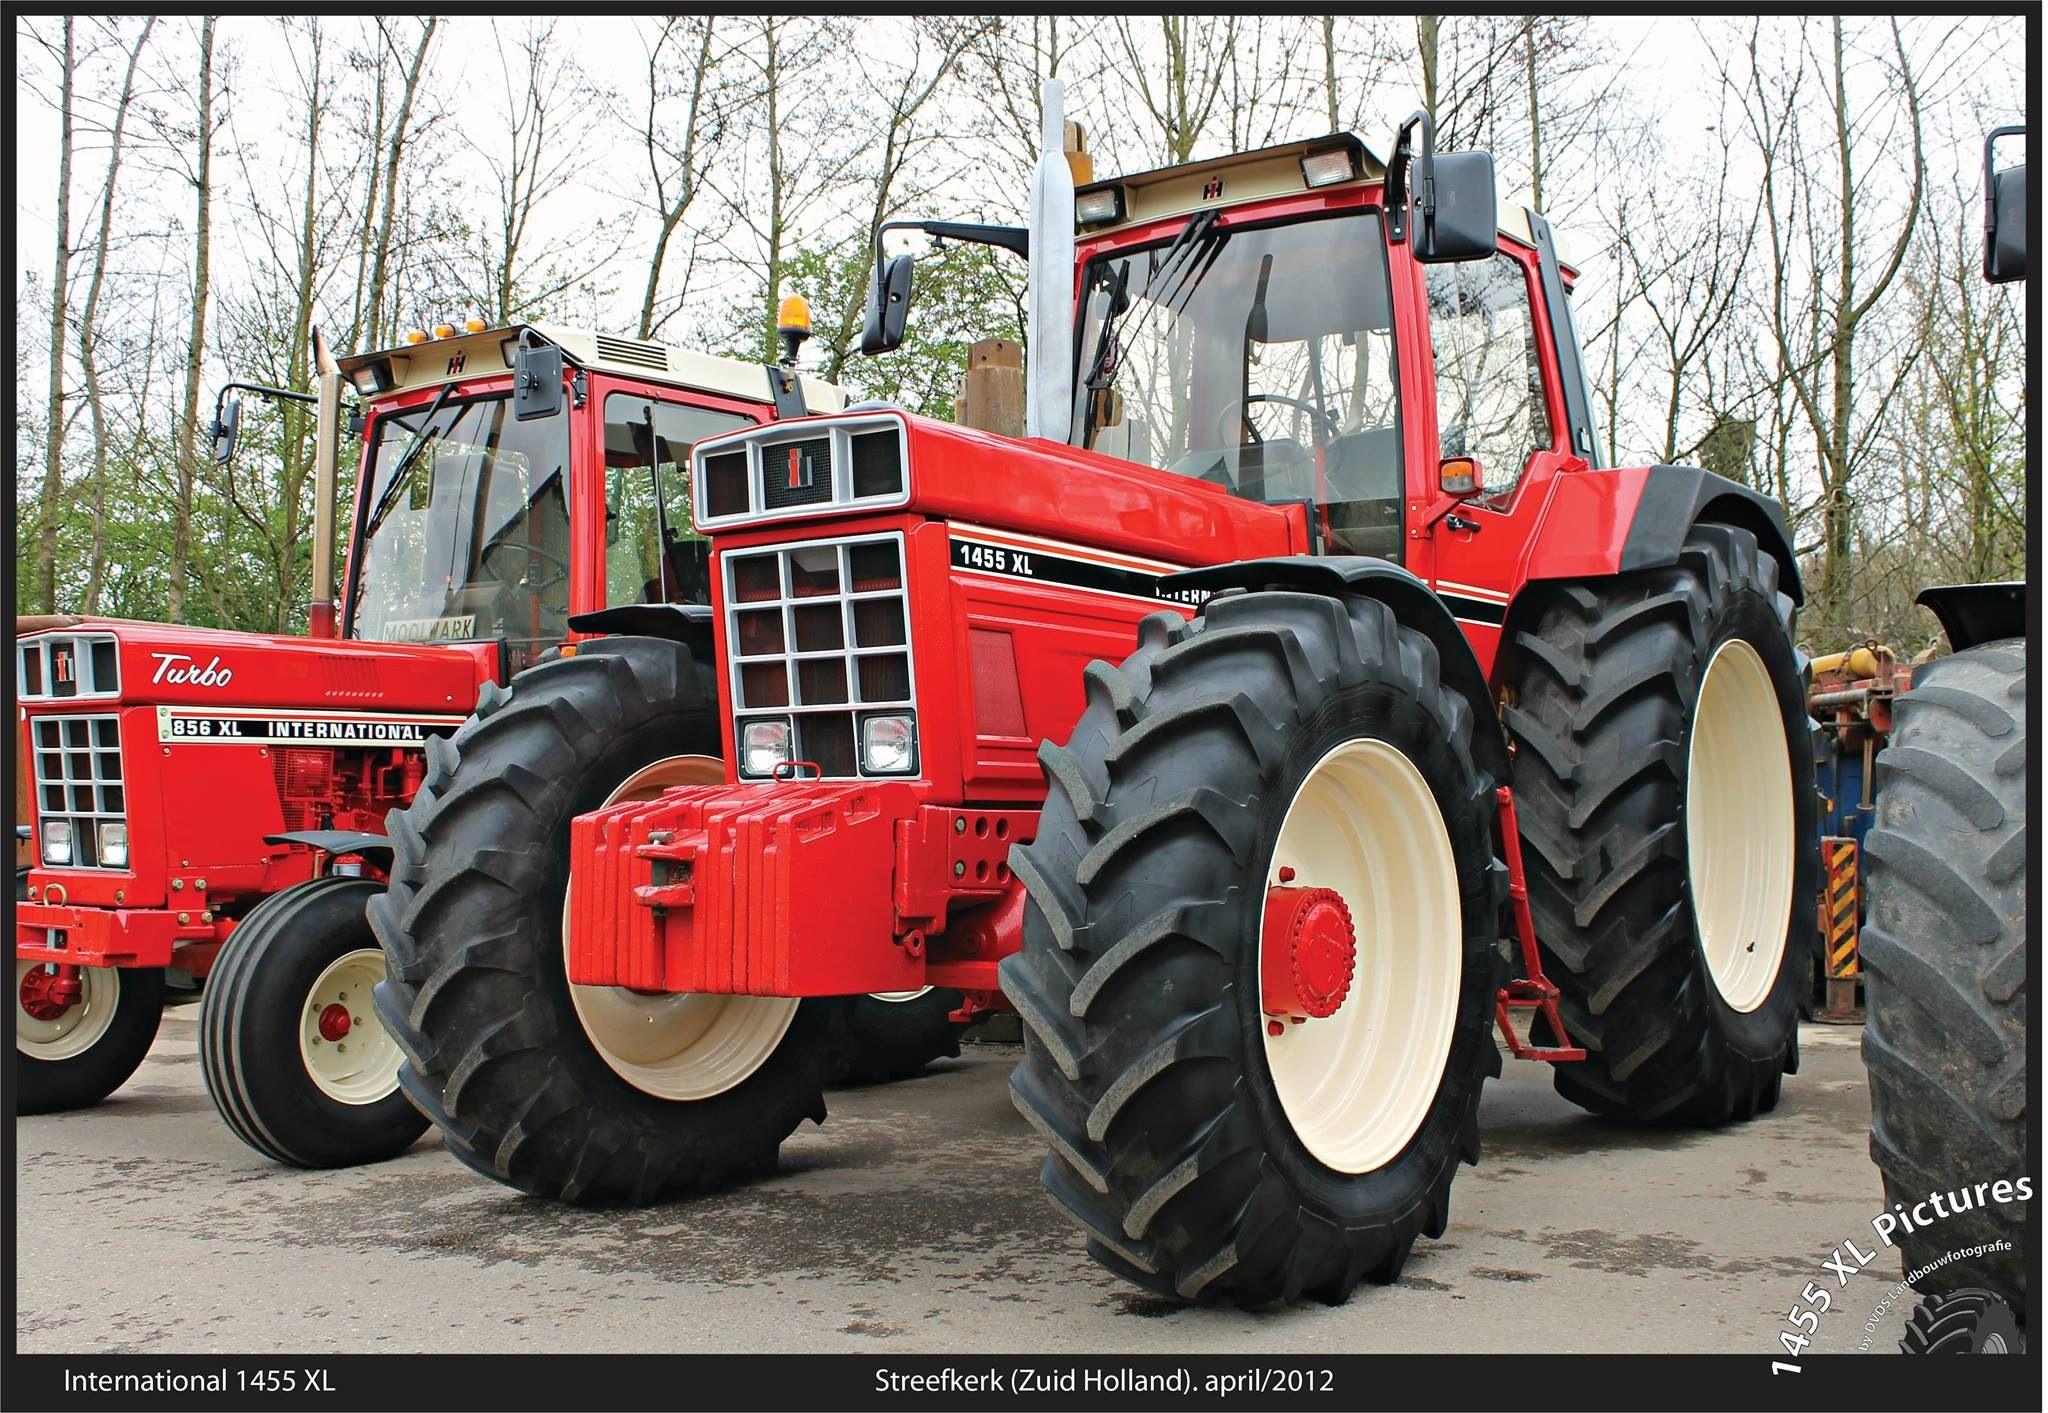 Sweet 1455 Xl Classic Tractor New Trucks Old Tractors